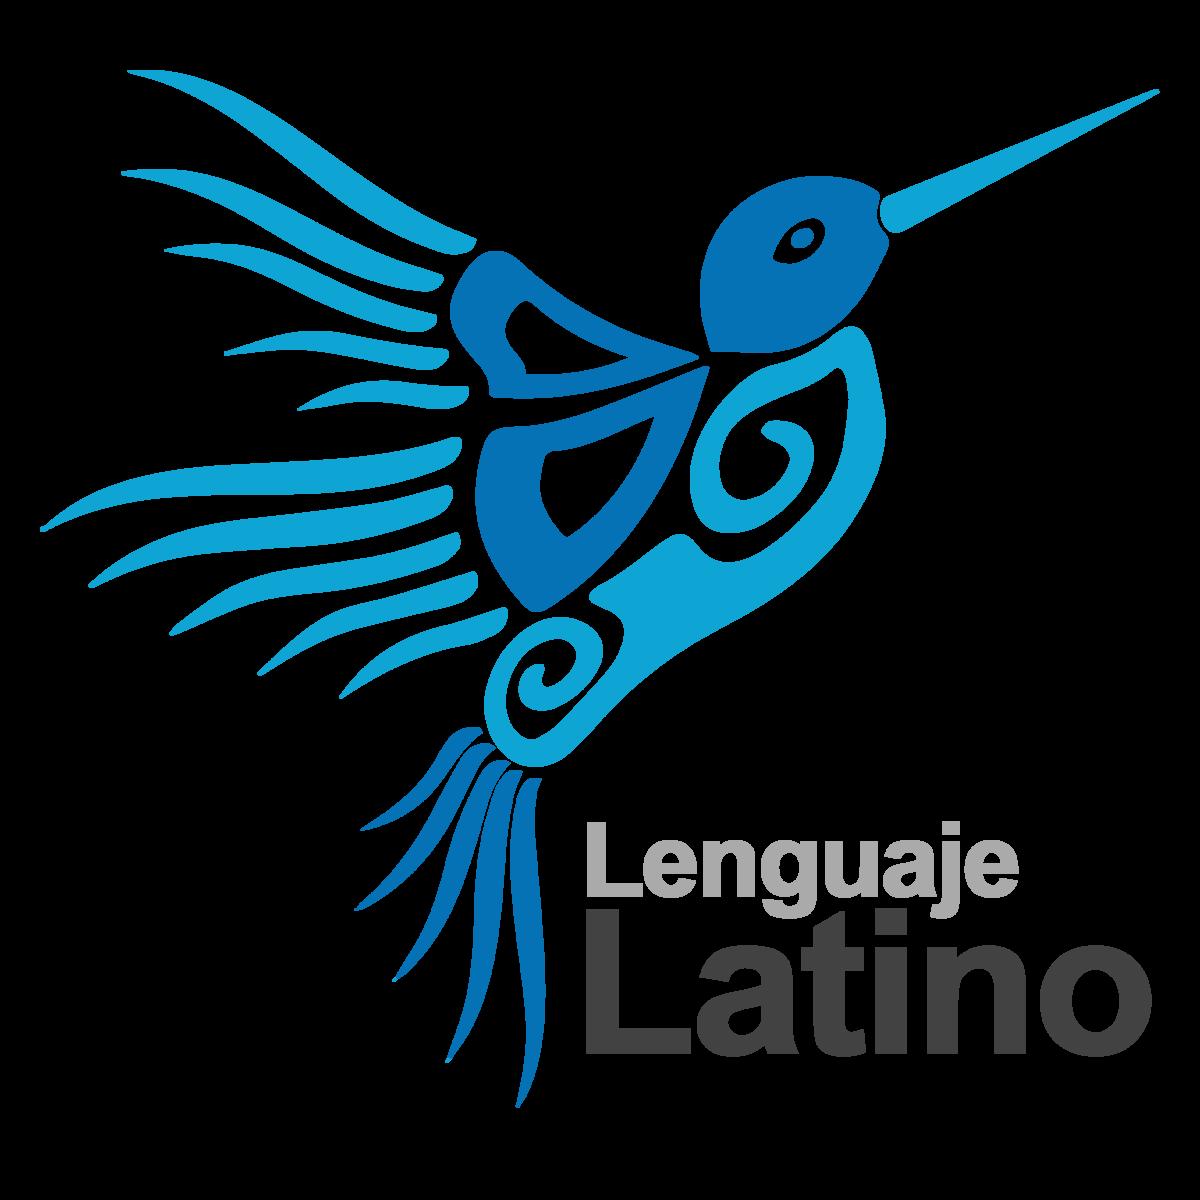 Latino Lenguaje De Programación Wikipedia La Enciclopedia Libre